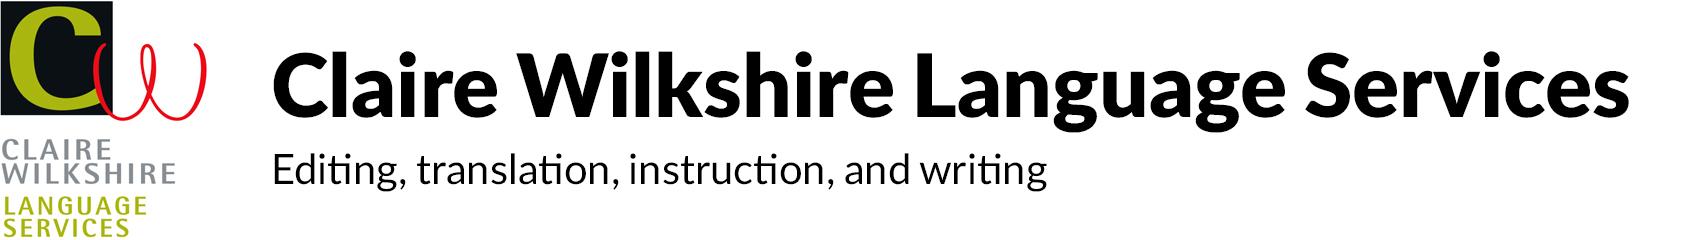 Claire Wilkshire Language Services Retina Logo